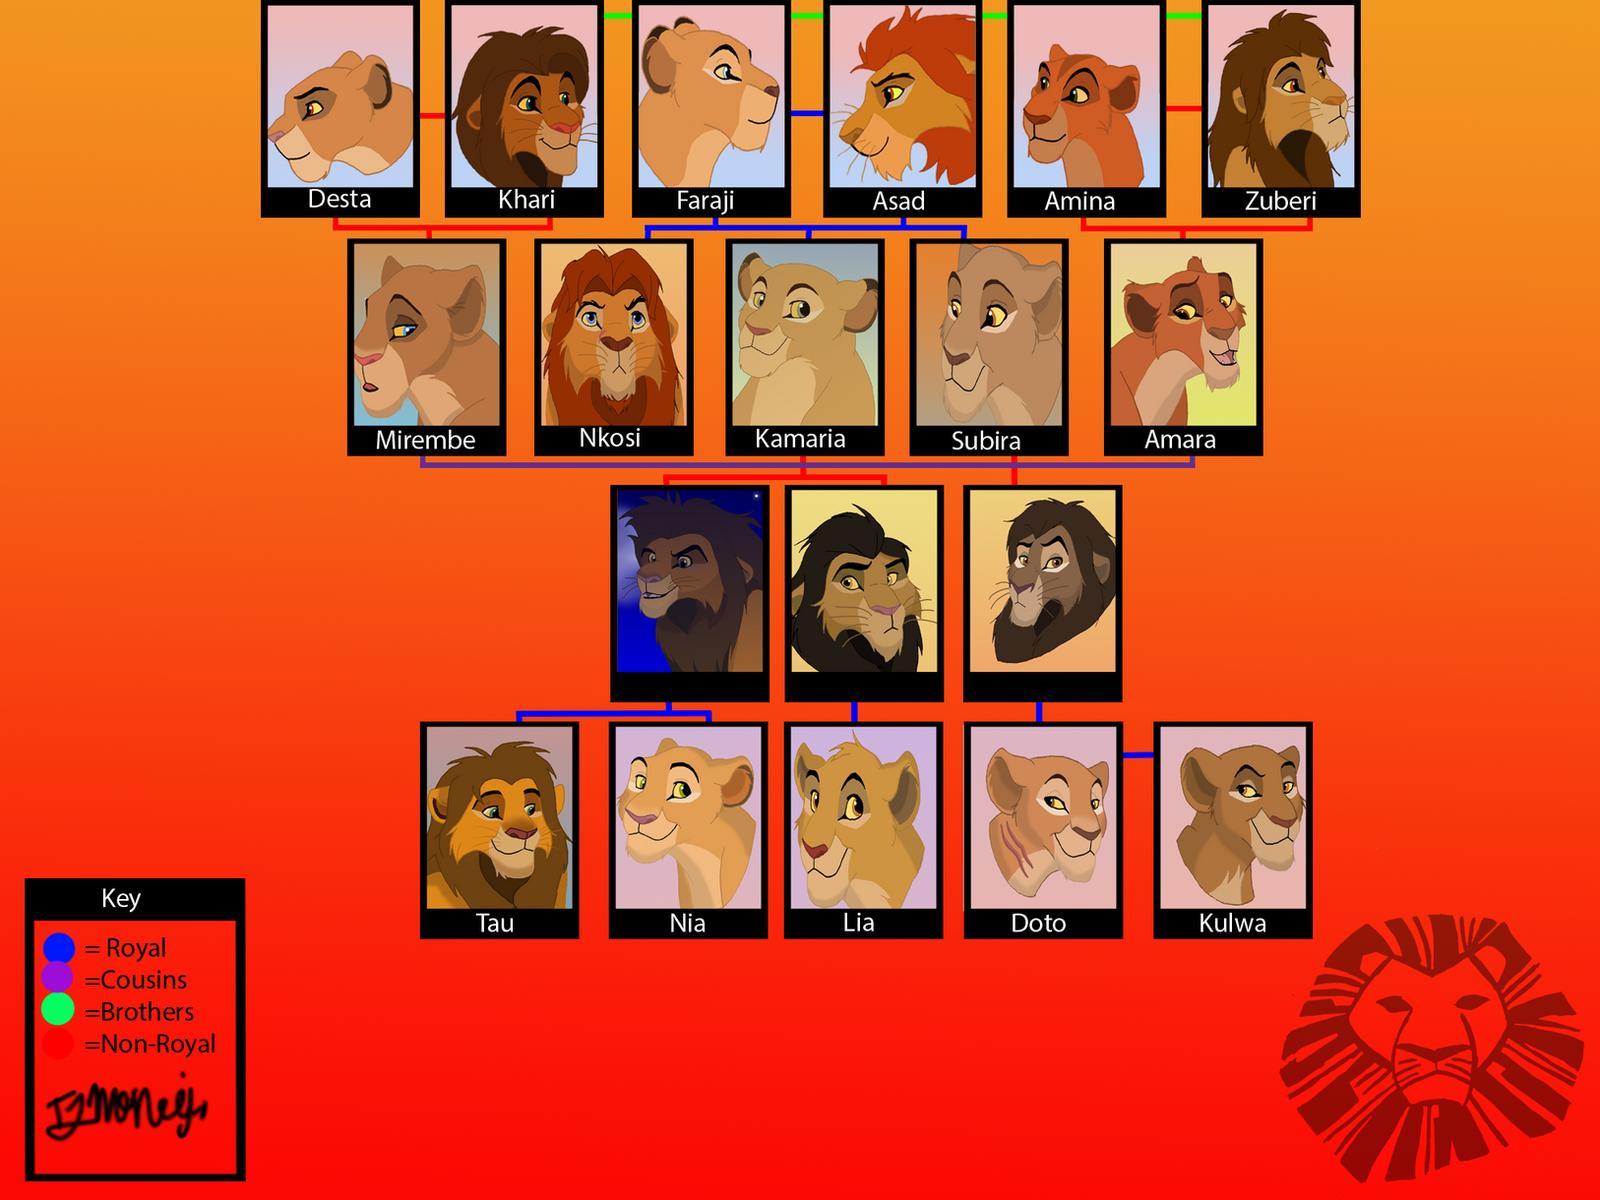 Lion King Family Tree 2 By Tegan03 On DeviantArt